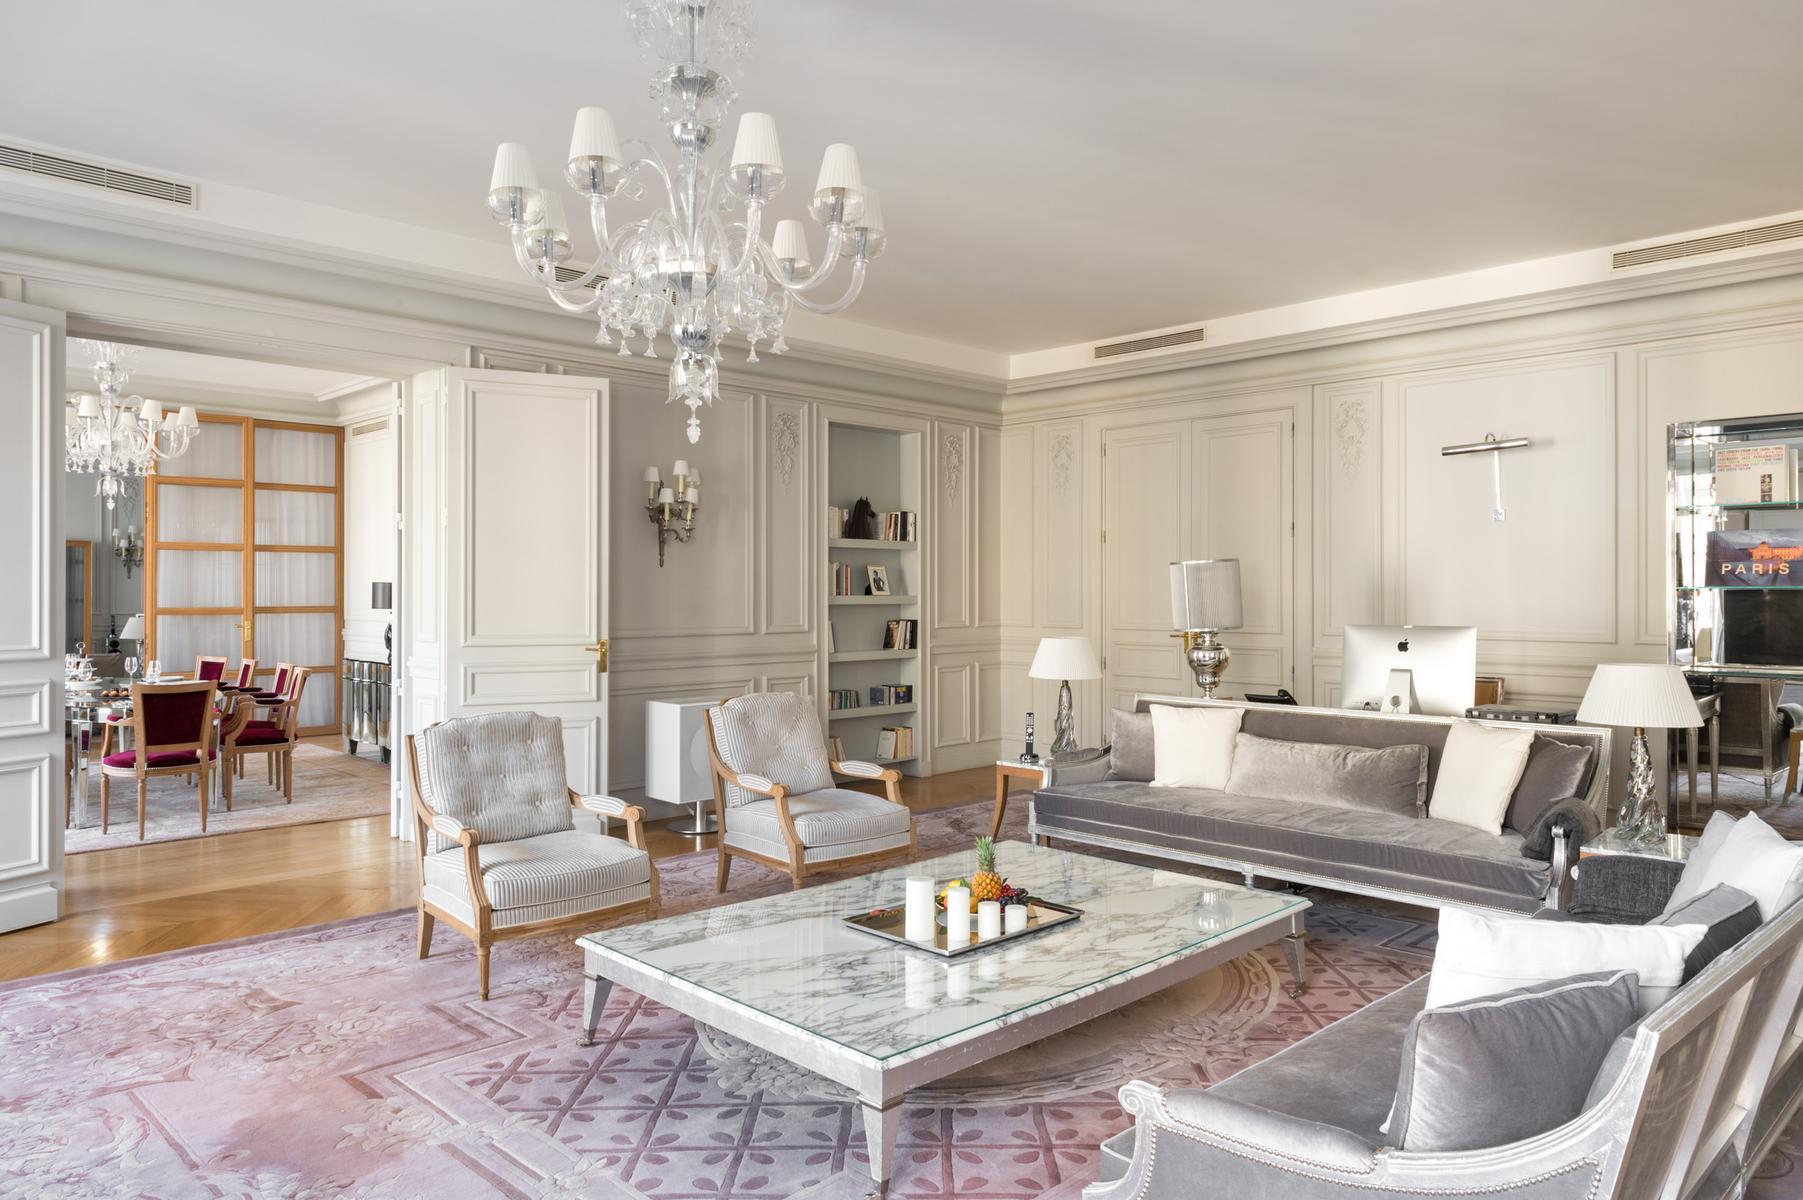 Paris - Avenue Hoche